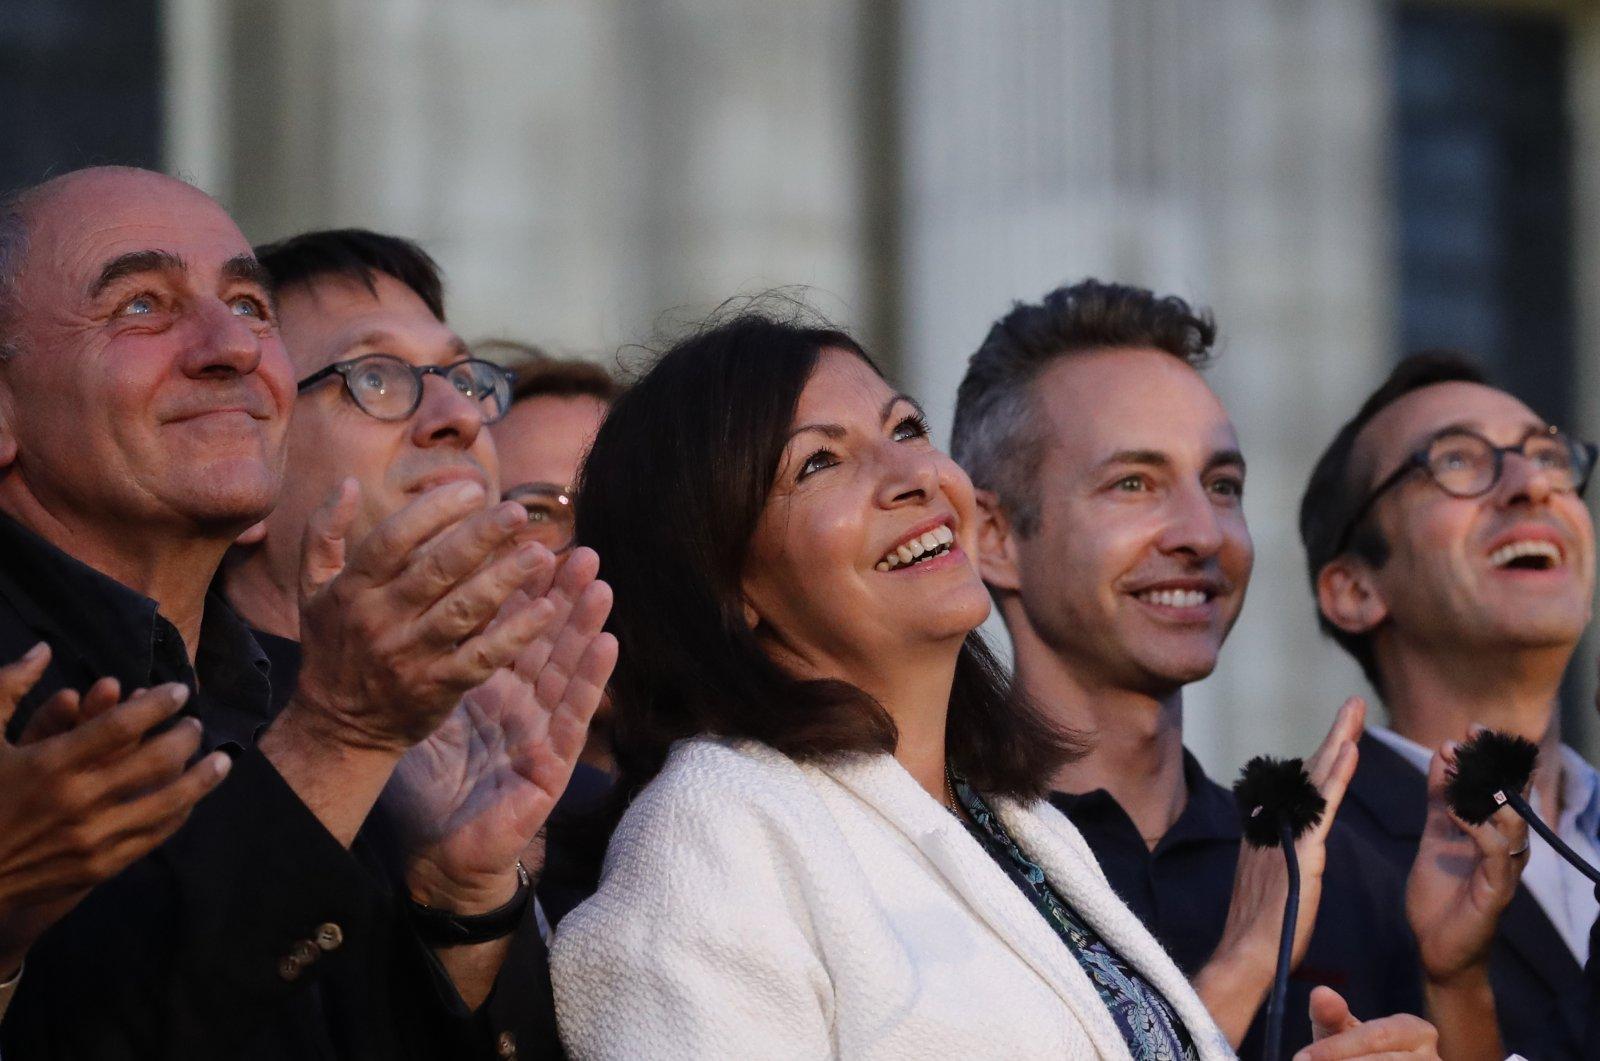 Paris Mayor Anne Hidalgo (C) looks up after her victorious second round of the municipal election, Paris, France, June 28, 2020. (AP Photo)